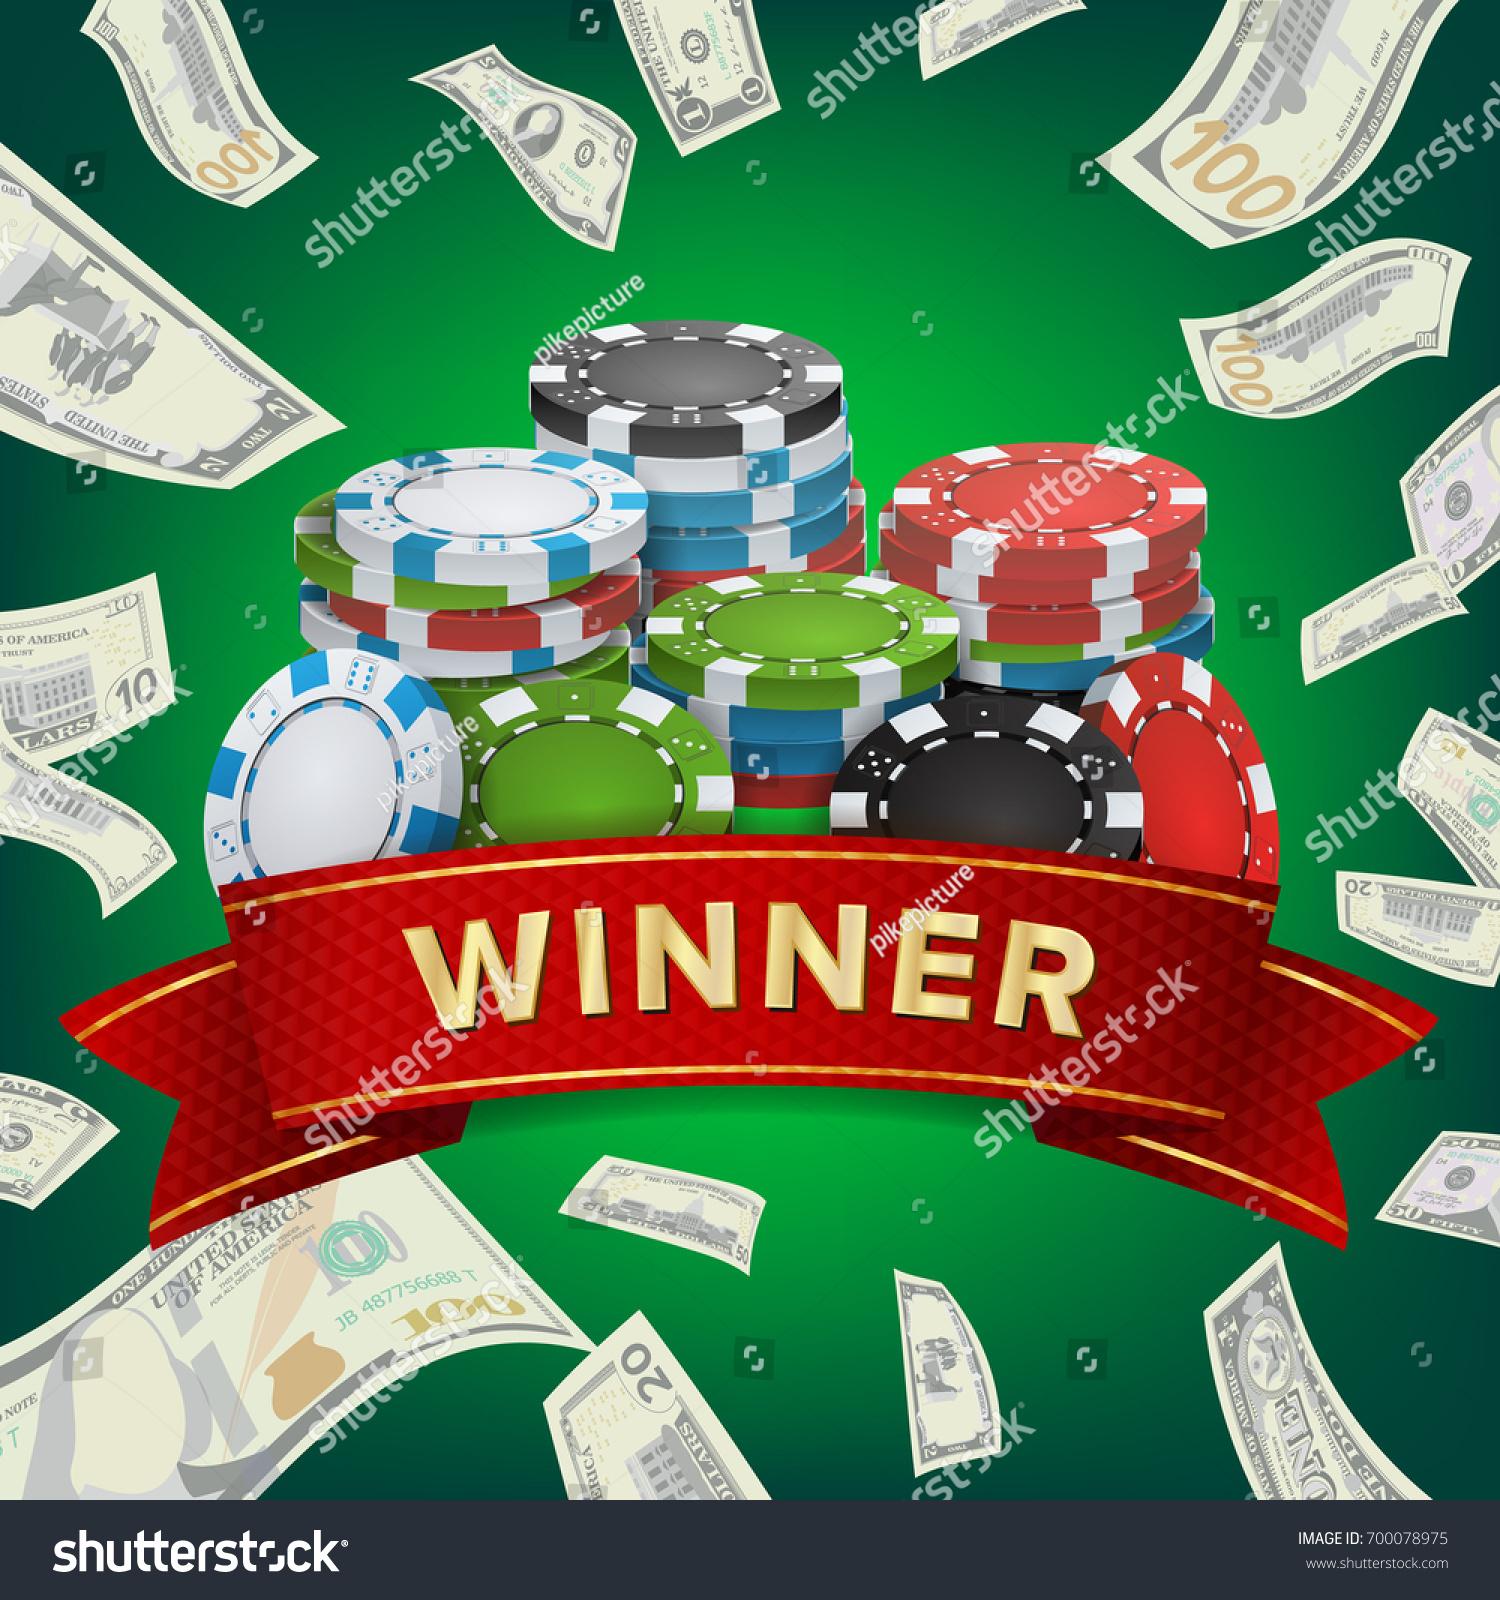 book of ra online casino real money